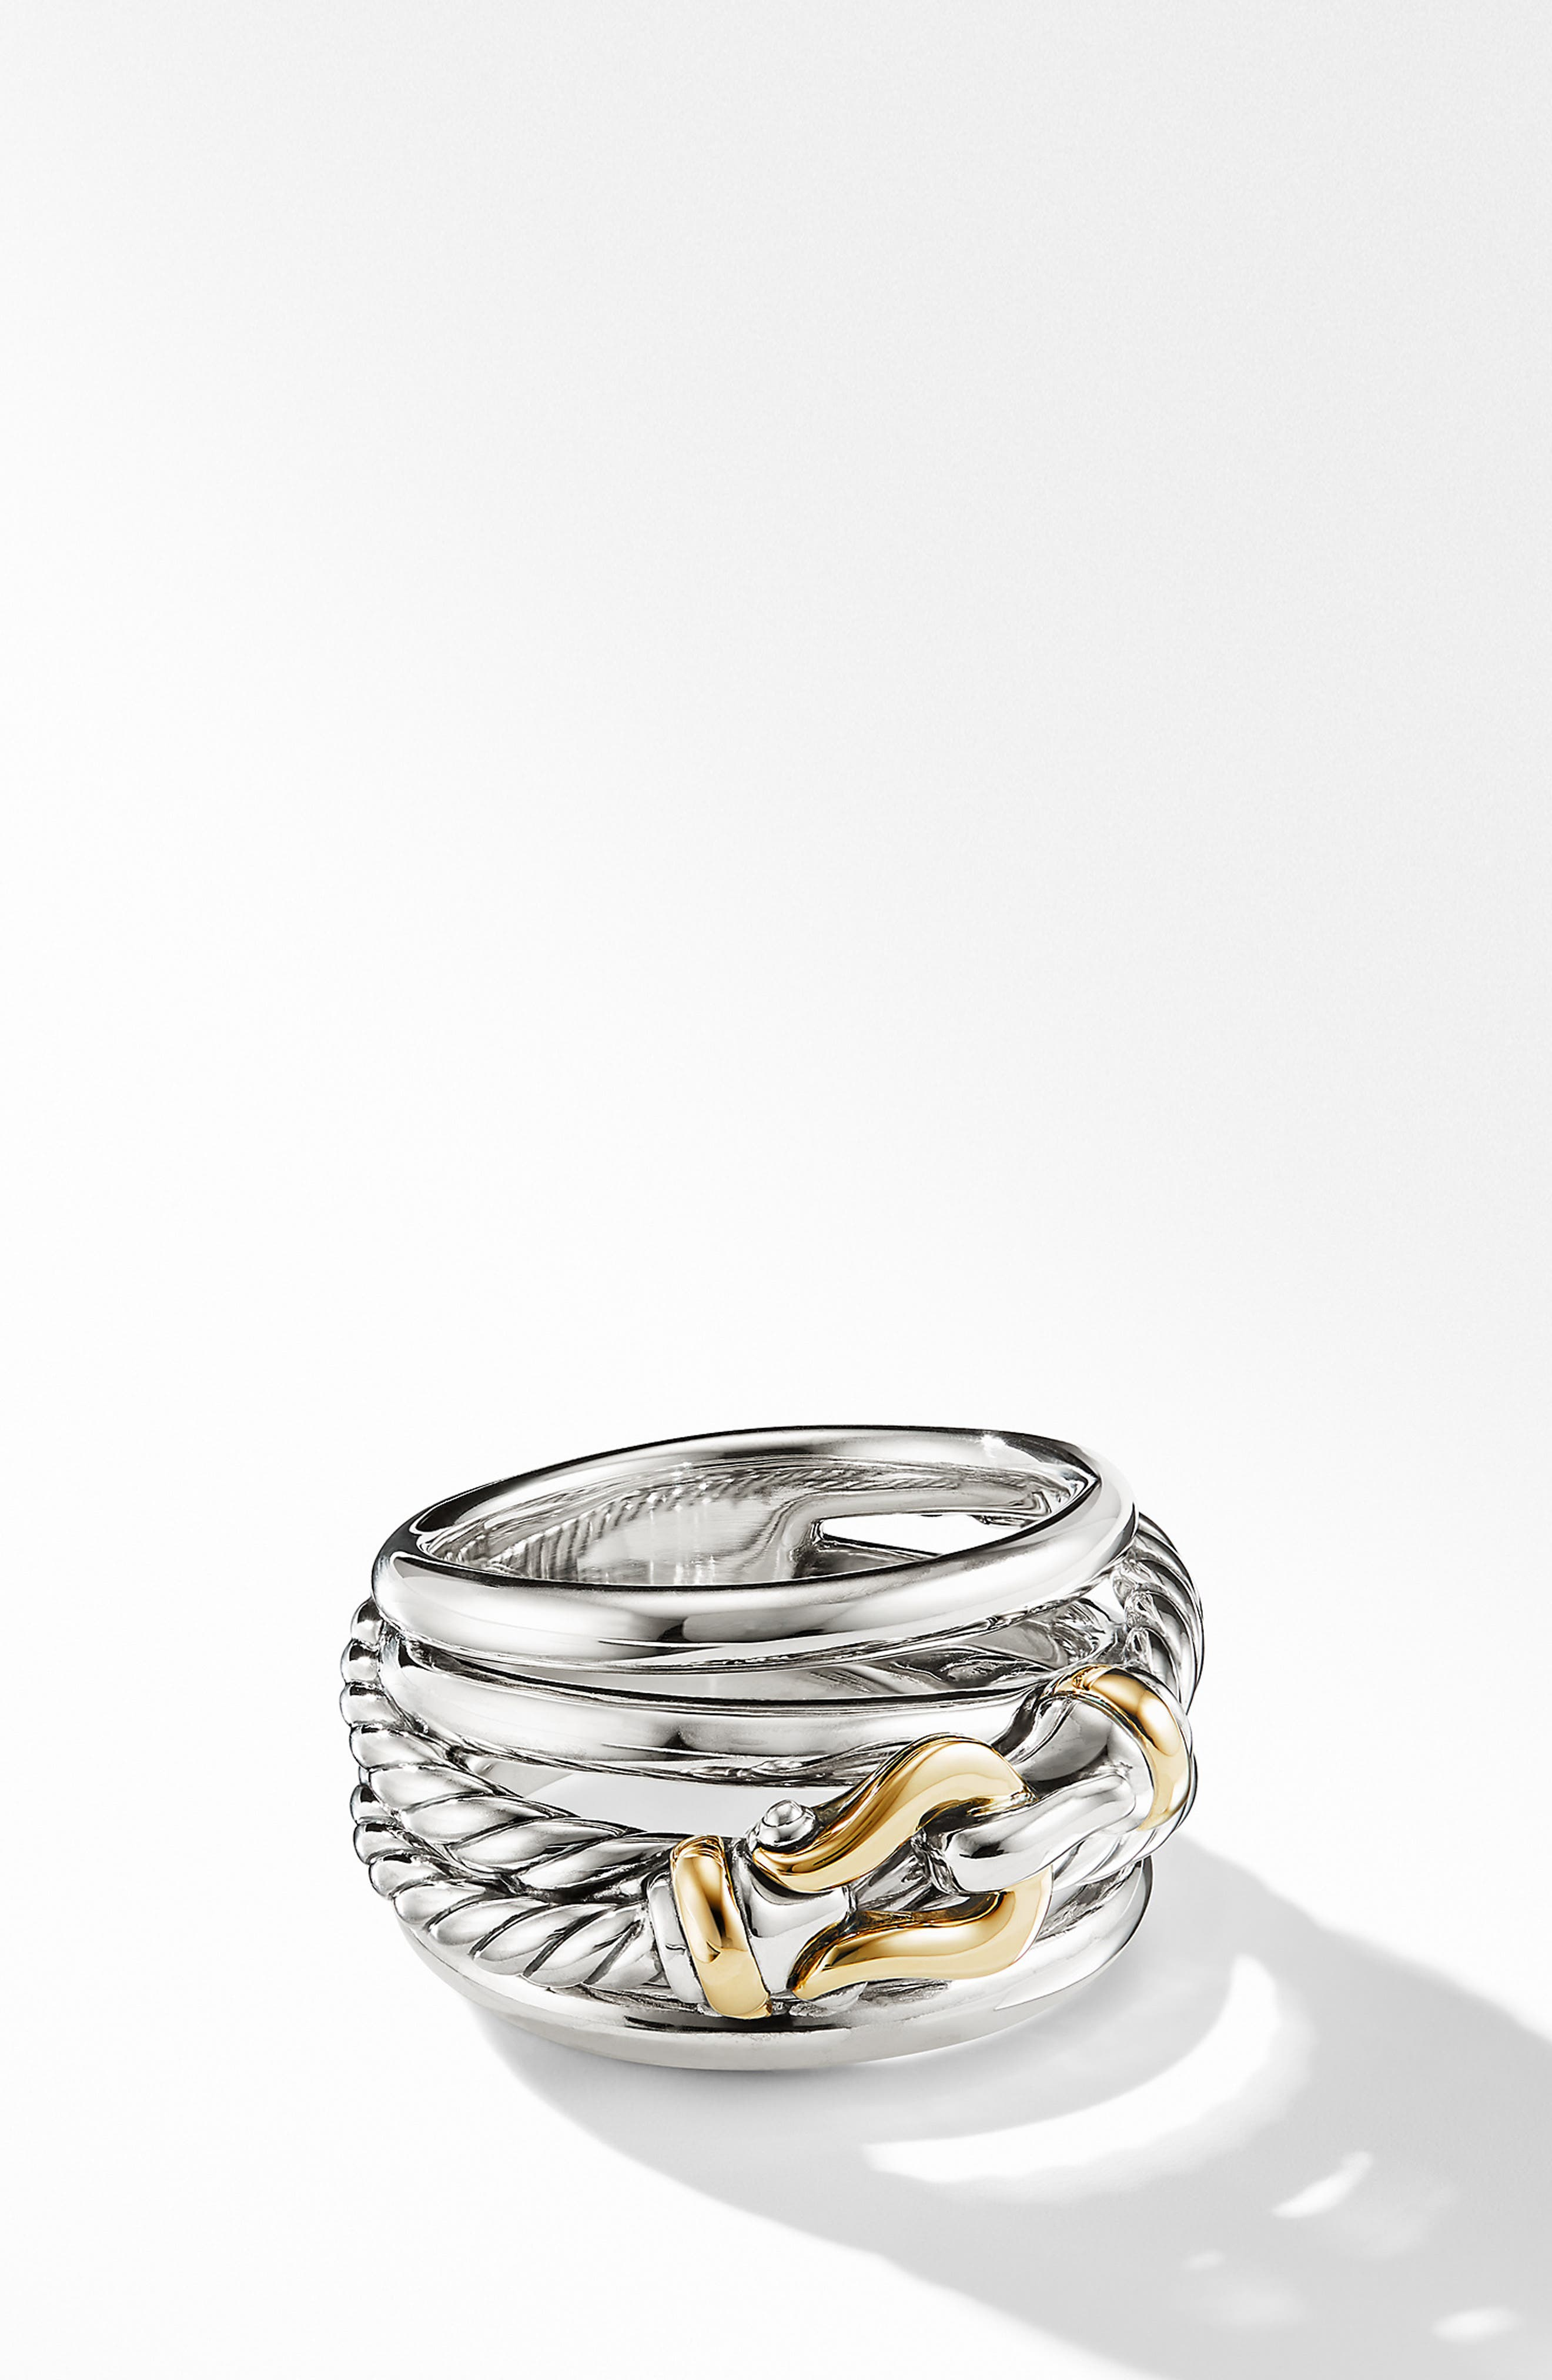 DAVID YURMAN Buckle Ring, Main, color, SILVER/ GOLD